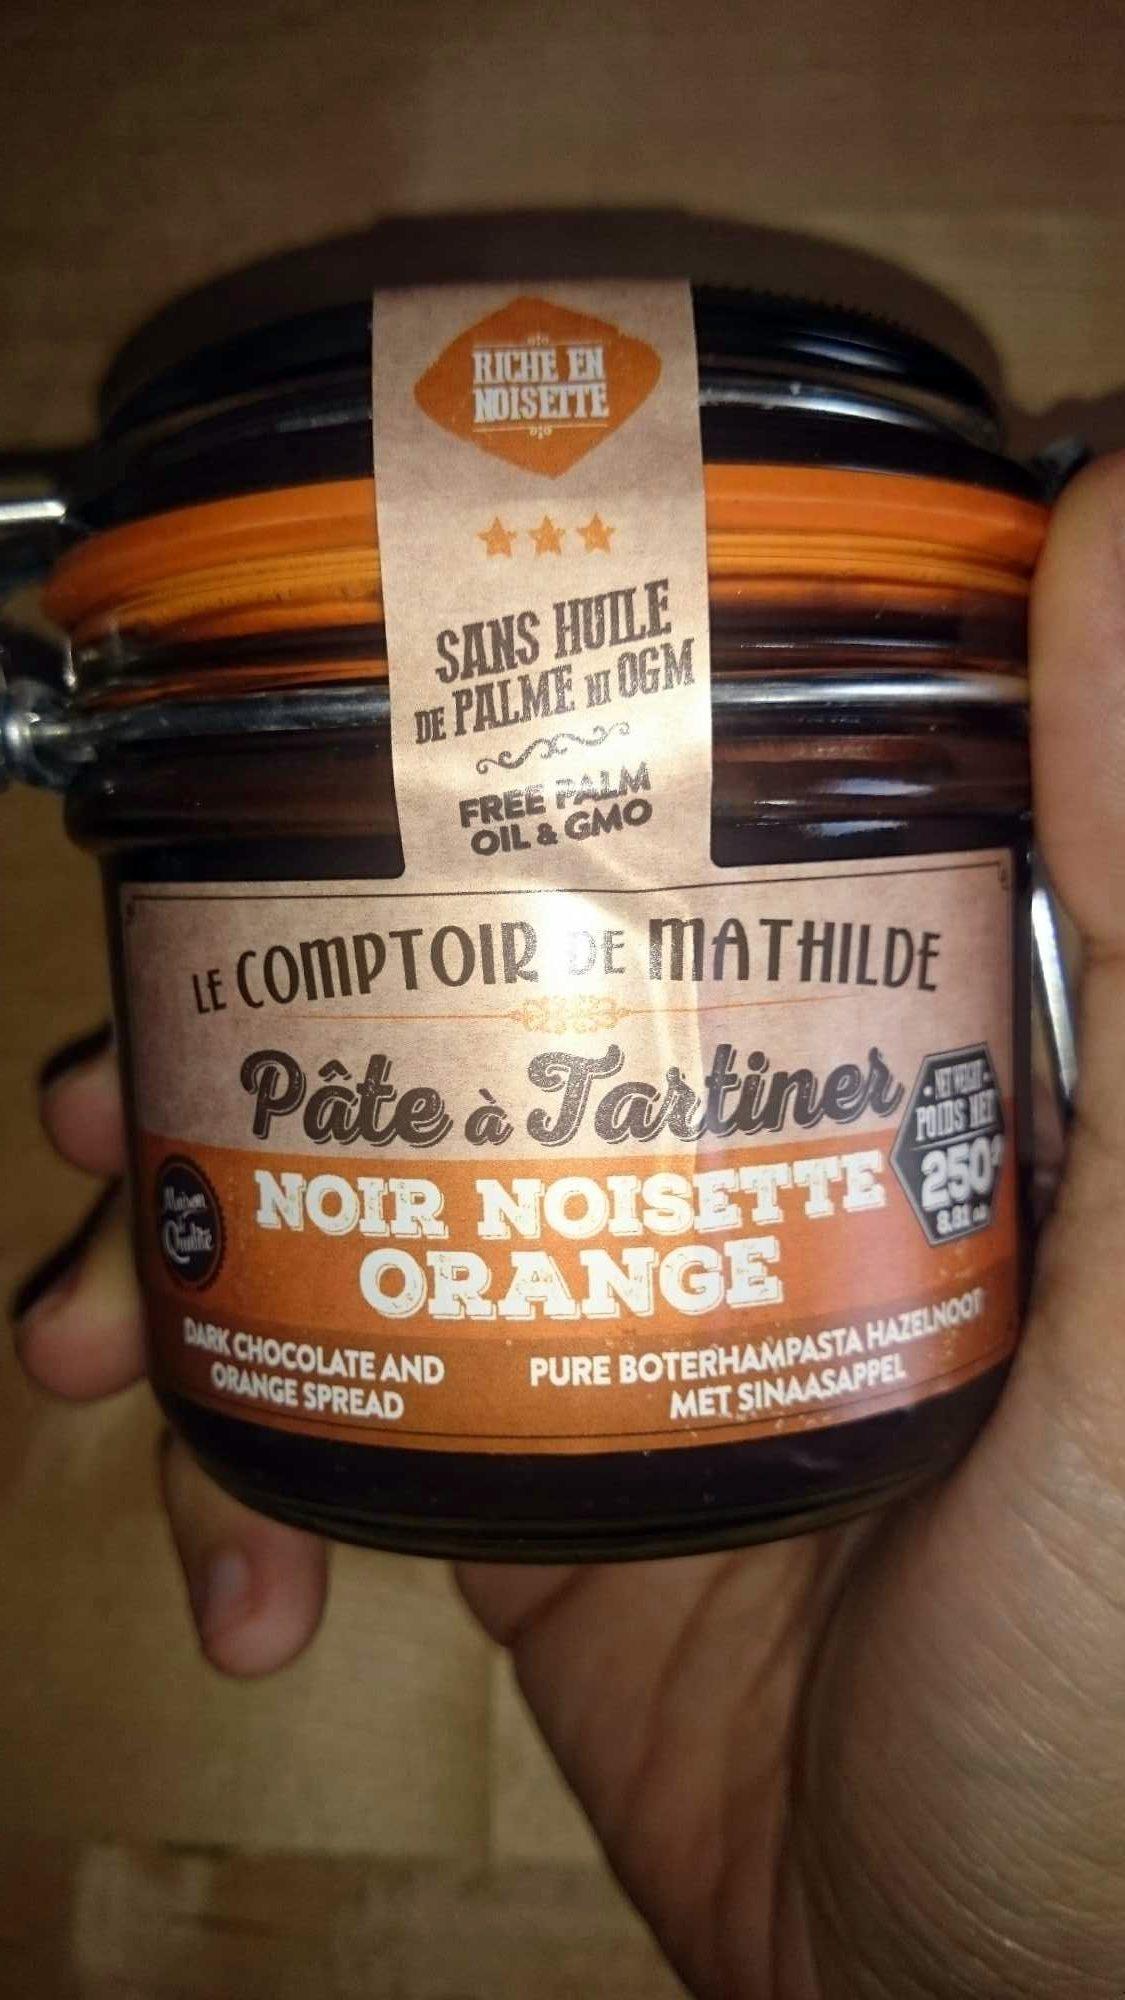 P te tartiner noir noisette orange le comptoir de - Pate a tartiner le comptoir de mathilde ...